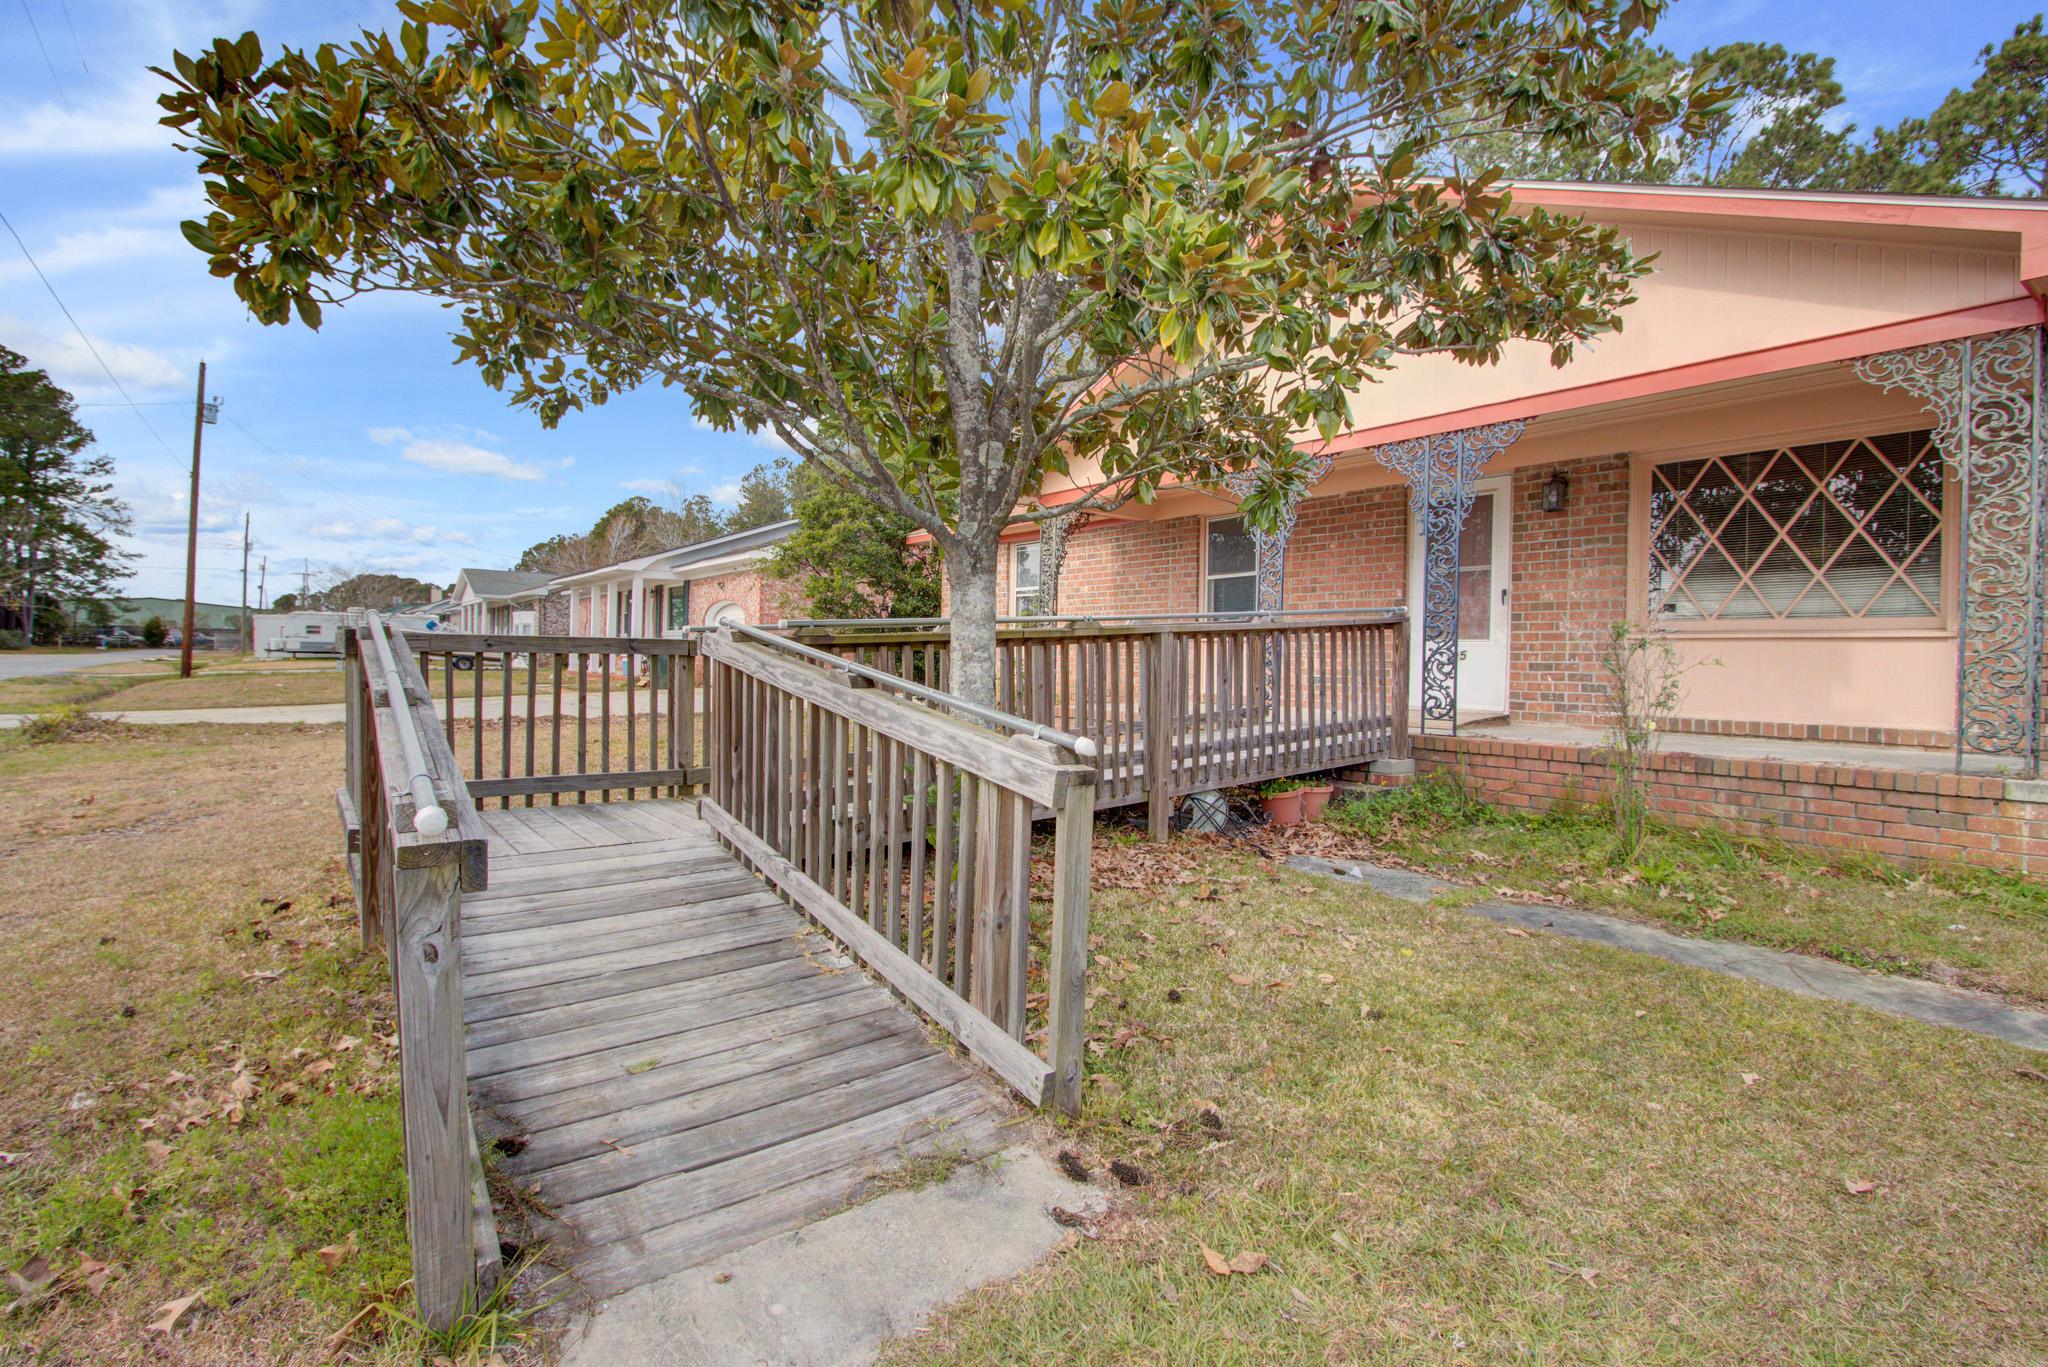 Bushy Park Terrace Homes For Sale - 125 Azalea, Goose Creek, SC - 1